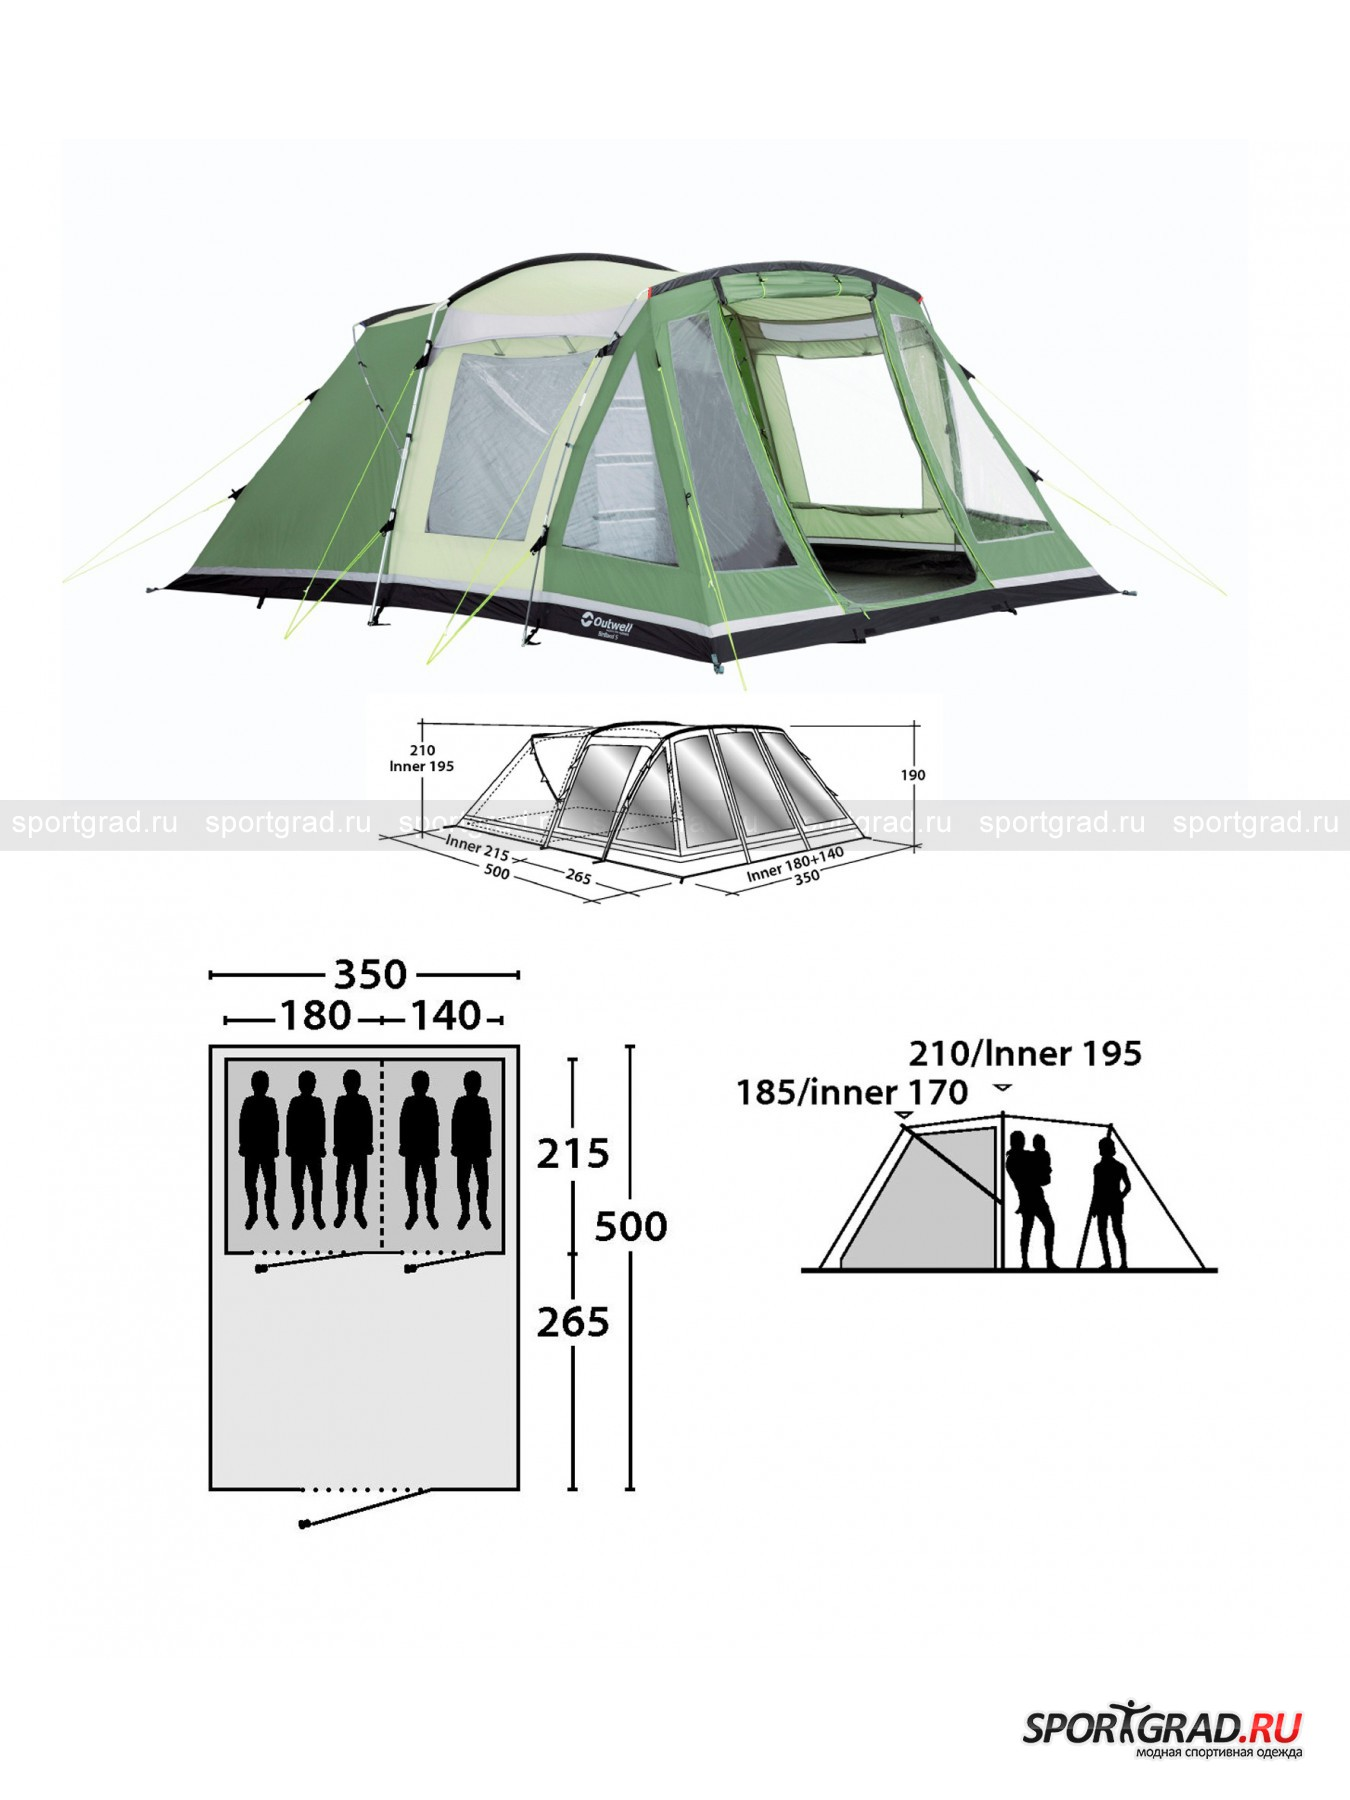 Палатка Birdland 5 OUTWELL от Спортград